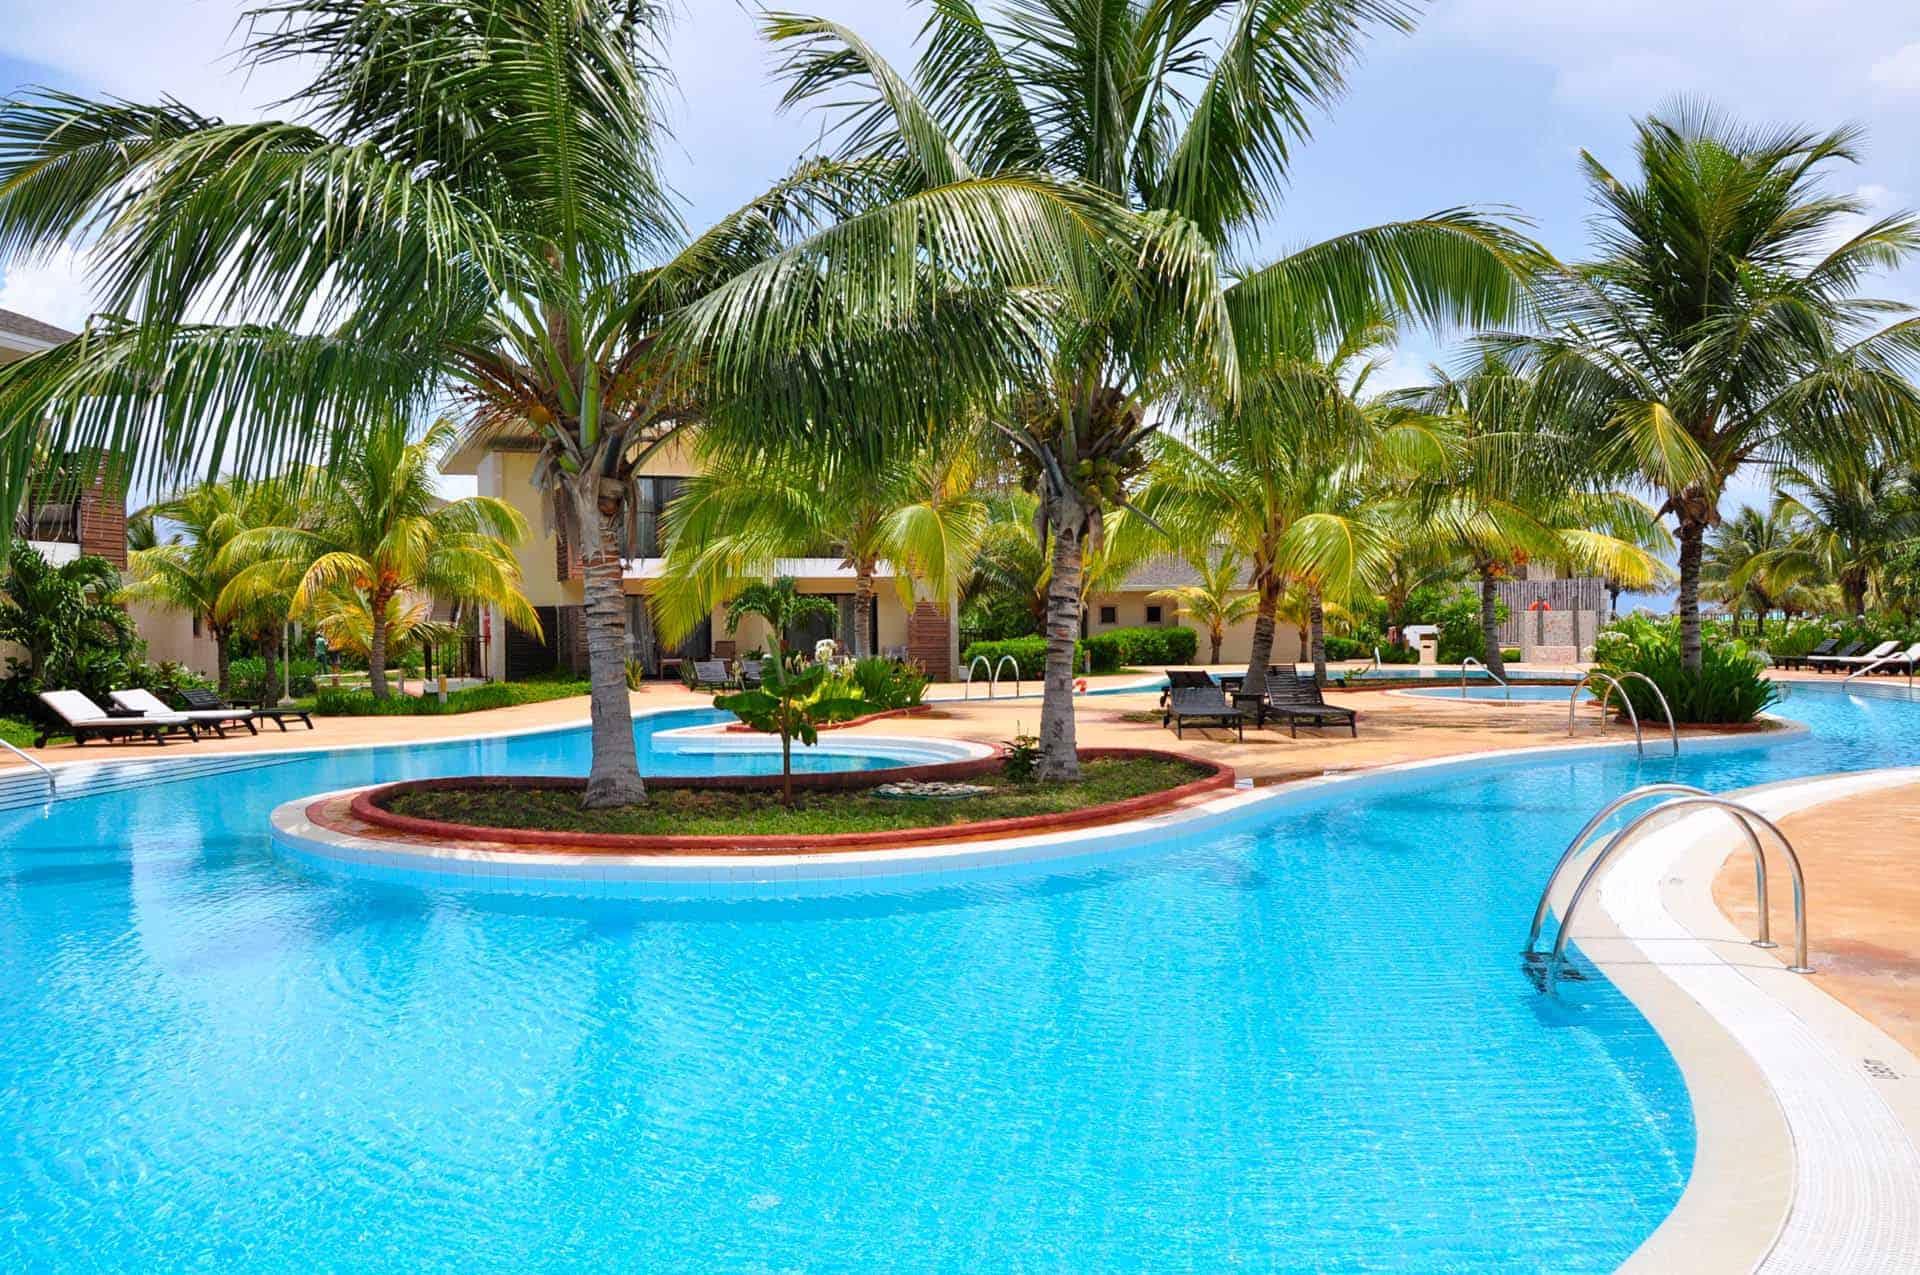 cayo santa maria hotel piscine palmiers cuba autrement 3